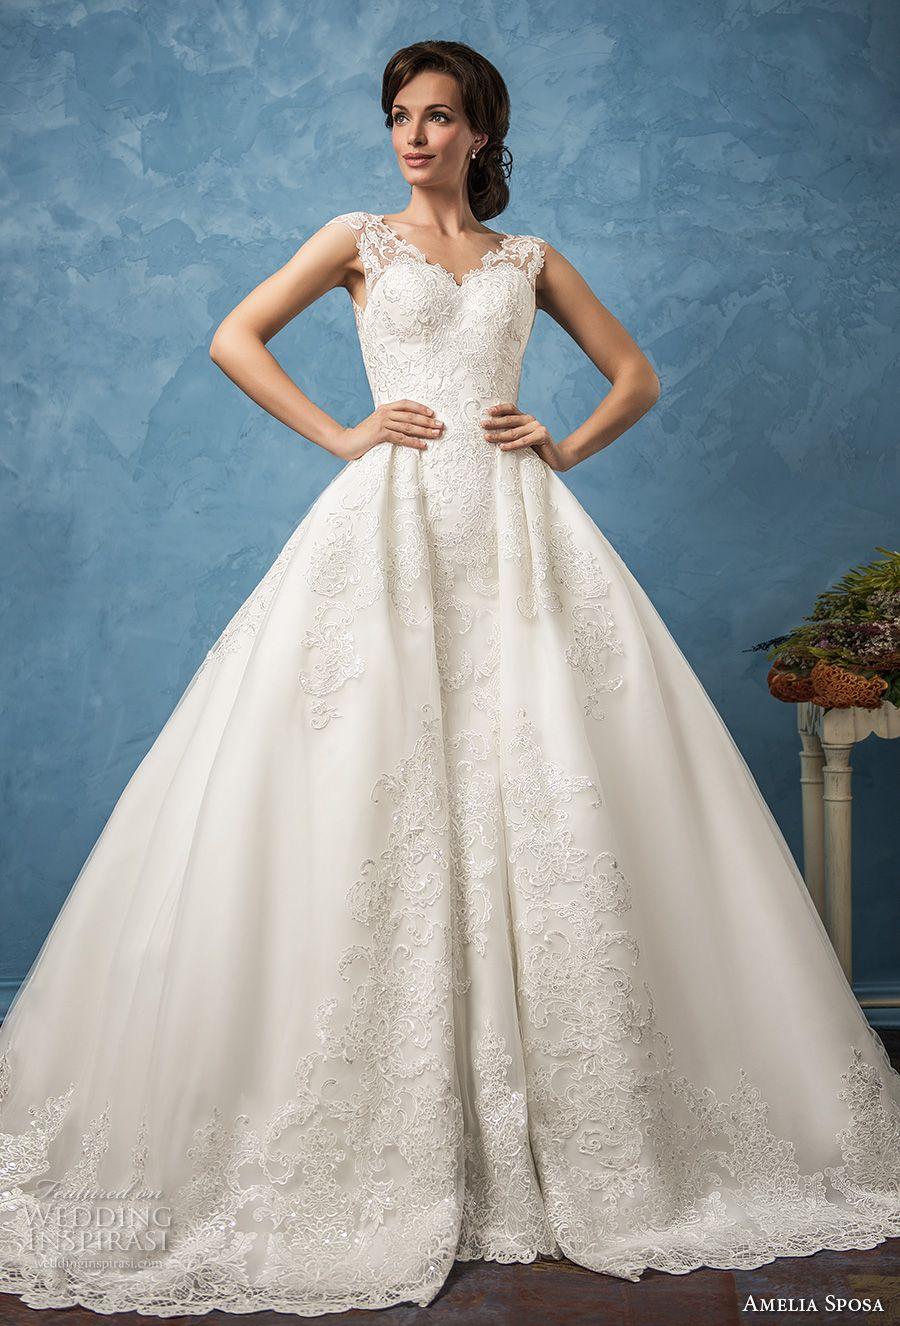 Beautiful Vestidos D Novia Baratos Images - Wedding Ideas ...